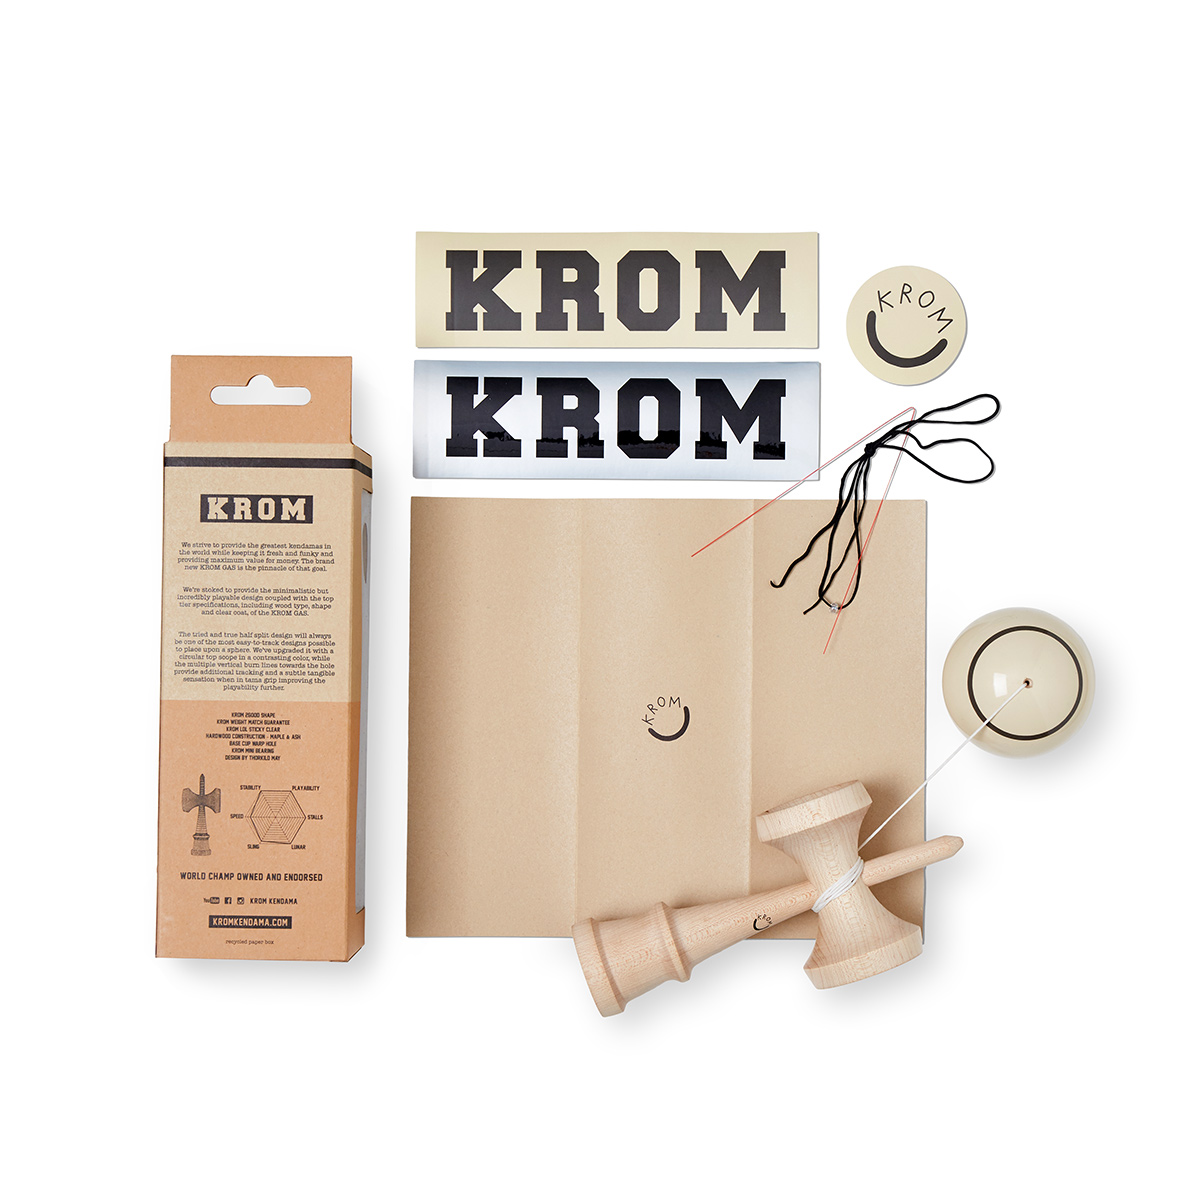 KROM - GAS - CREAM